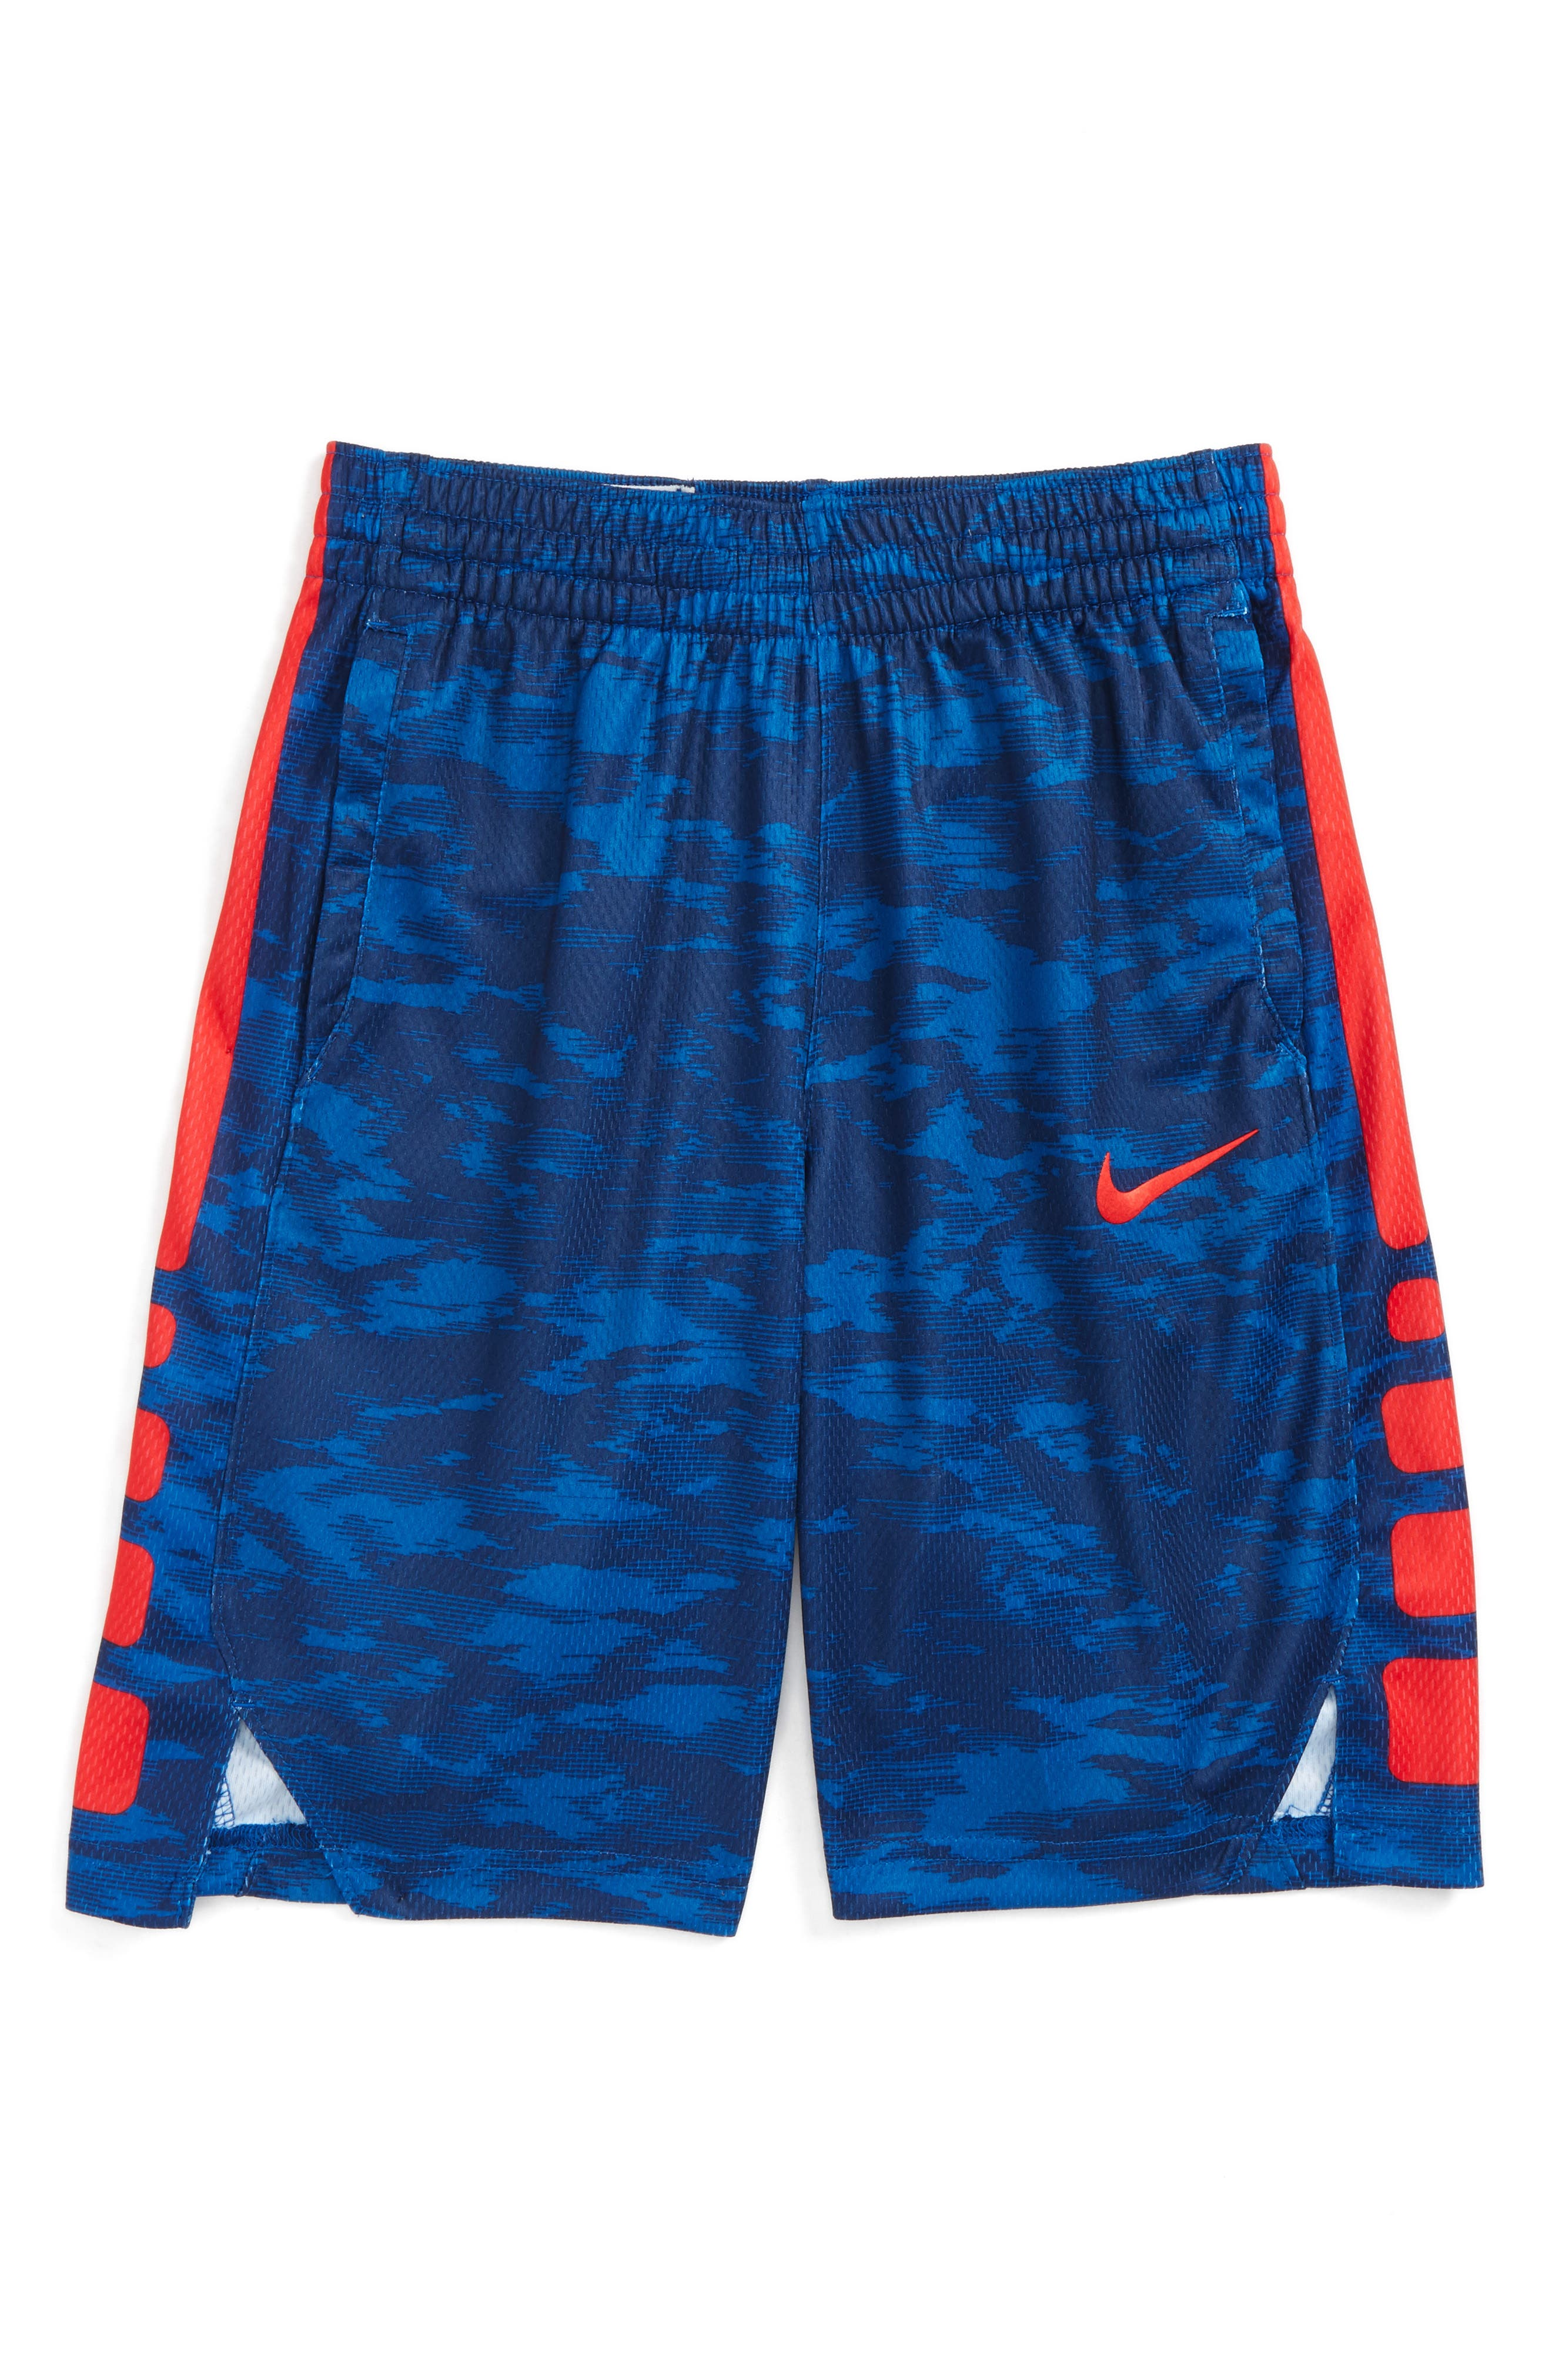 Alternate Image 1 Selected - Nike Dry Elite Basketball Shorts (Little Boys & Big Boys)